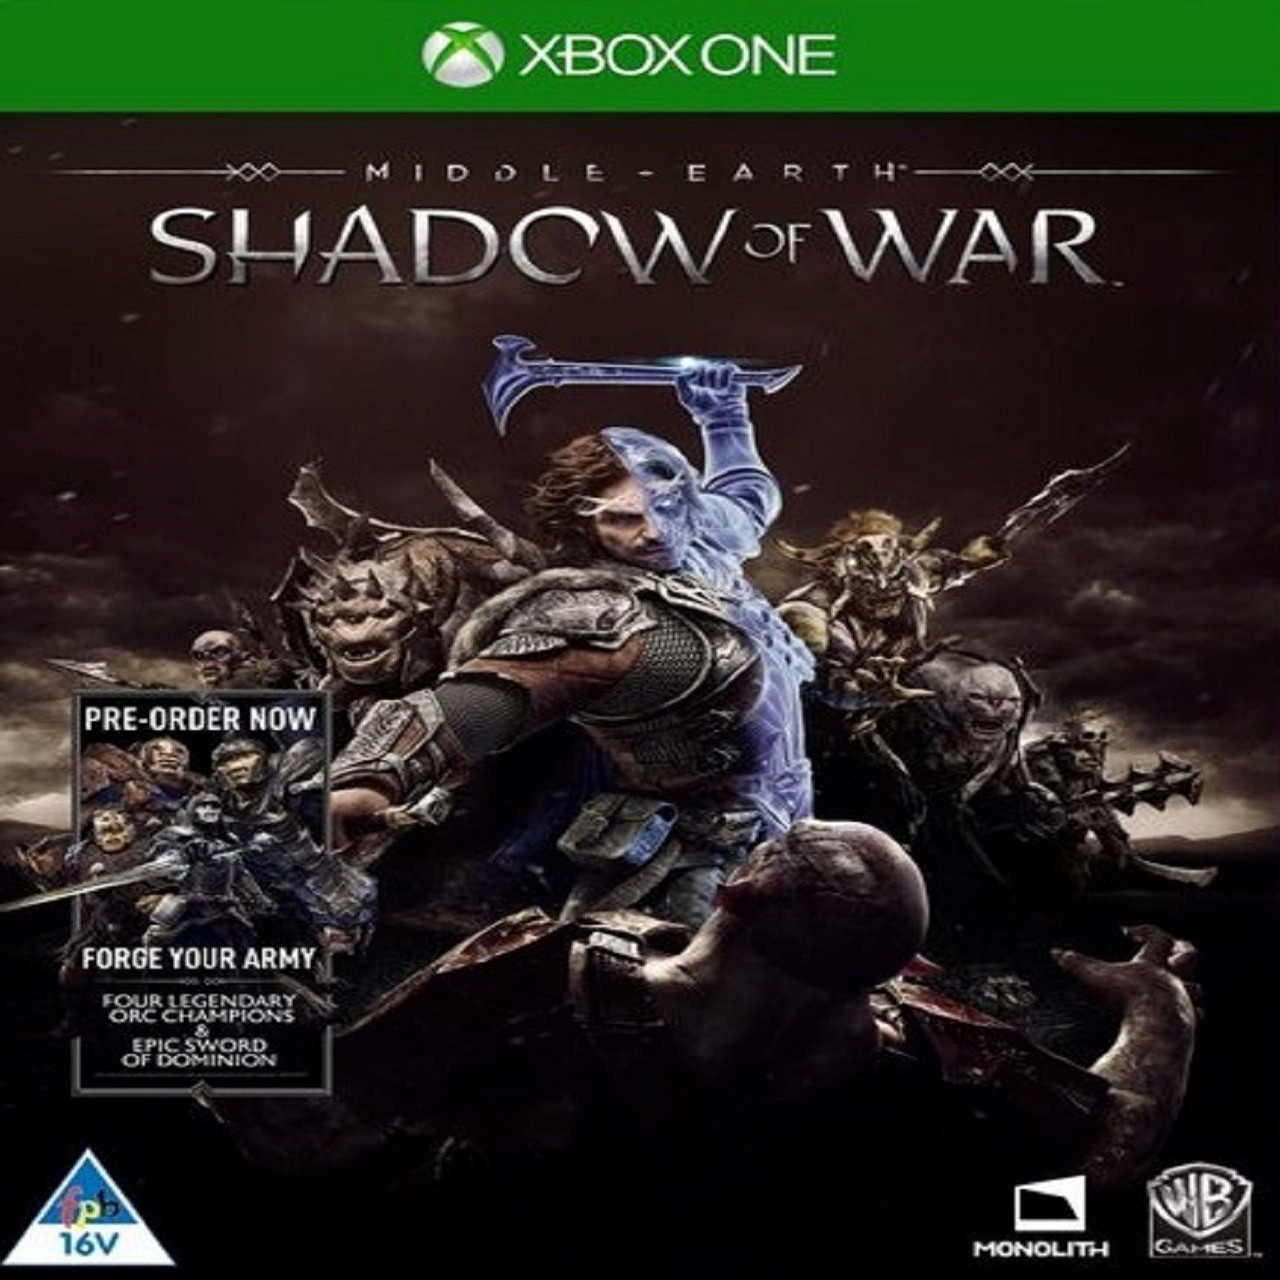 Middle-Earth:Shadow of War RUS Xbox One (Б/В)